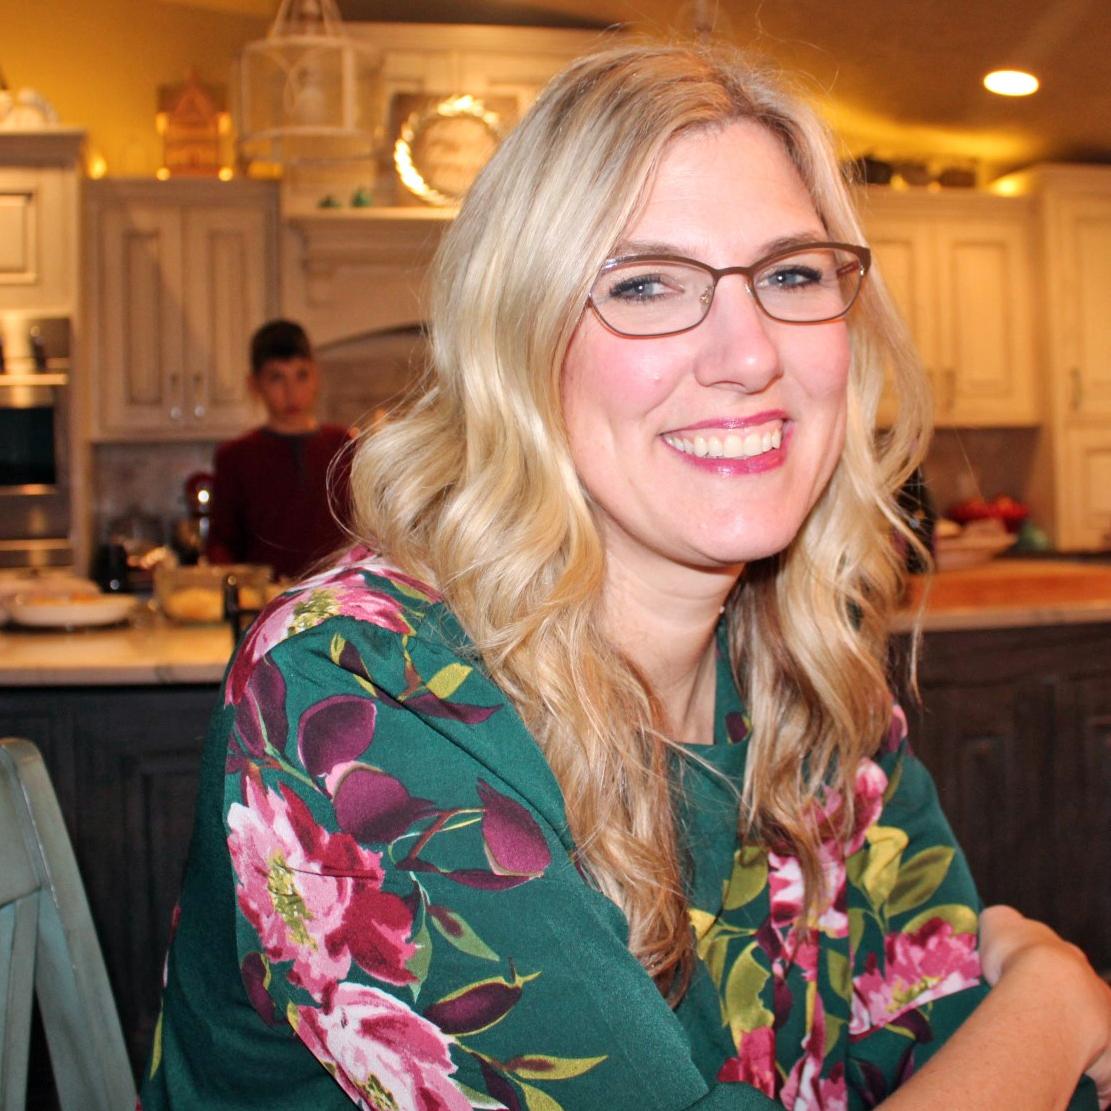 Leanne Skoog sitting at her kitchen table